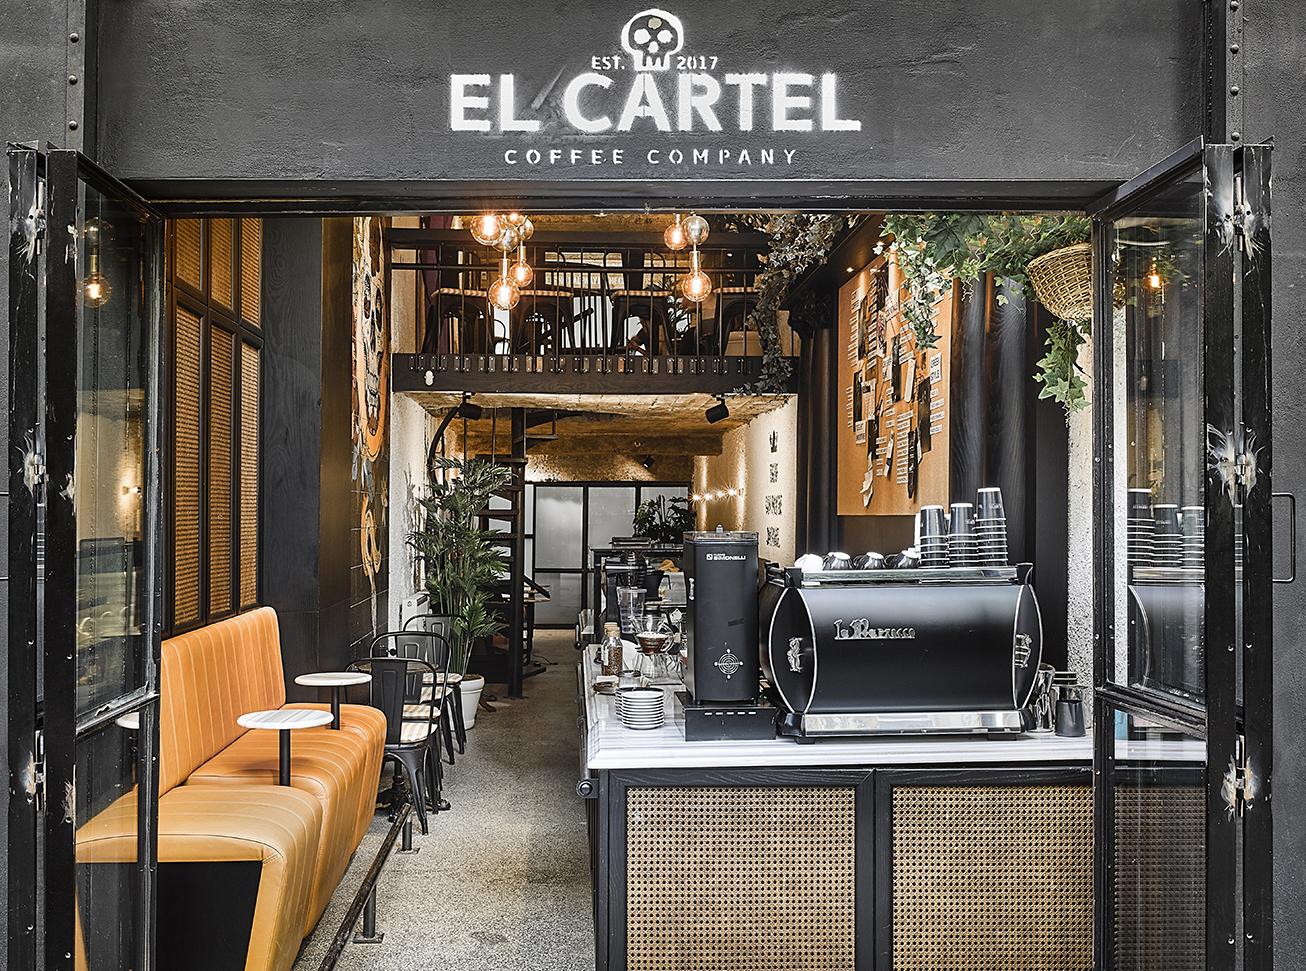 Cartel Coffee Company - İzmir, Alsancak, 2017